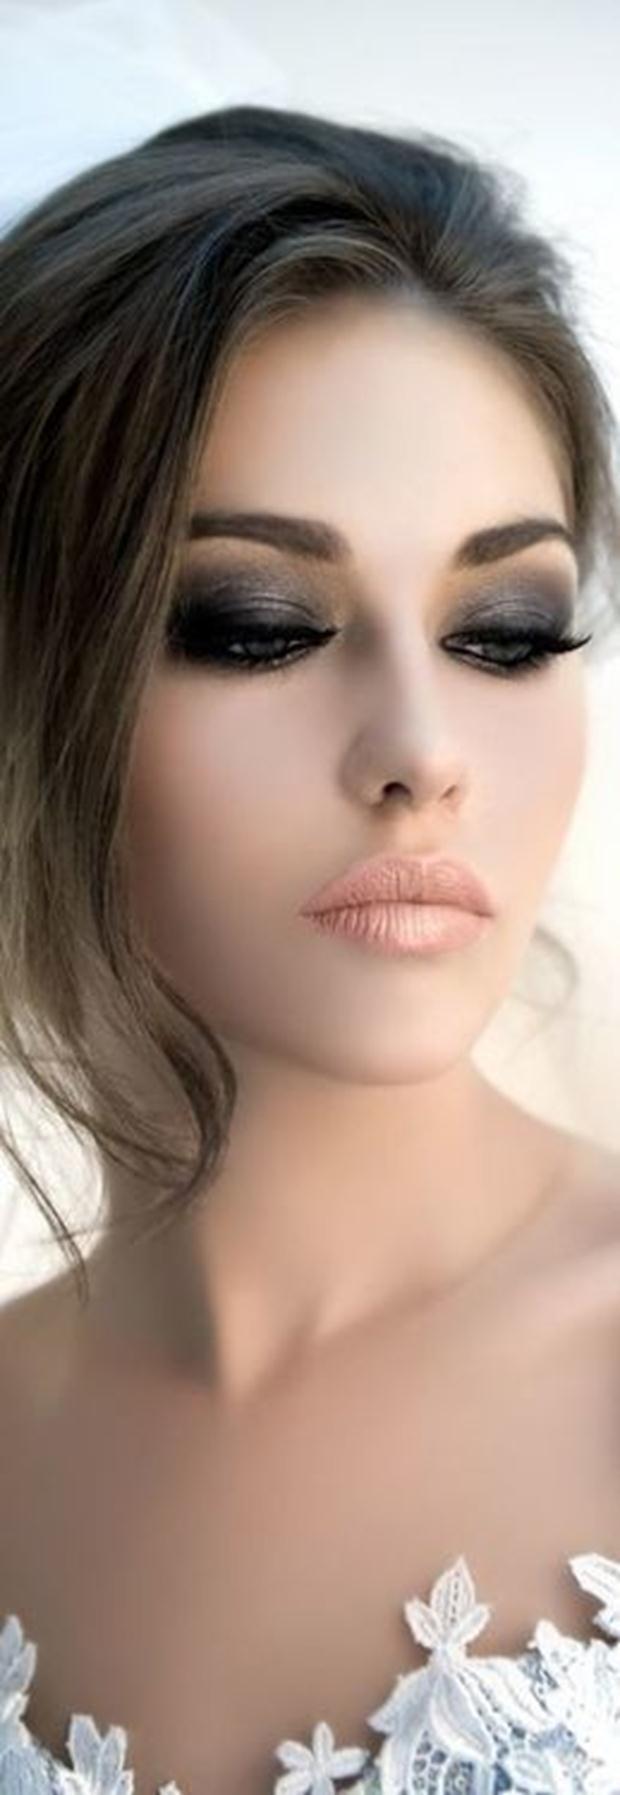 Black-Smoky-Eye-with-Nude-Lip-Makeup-Idea